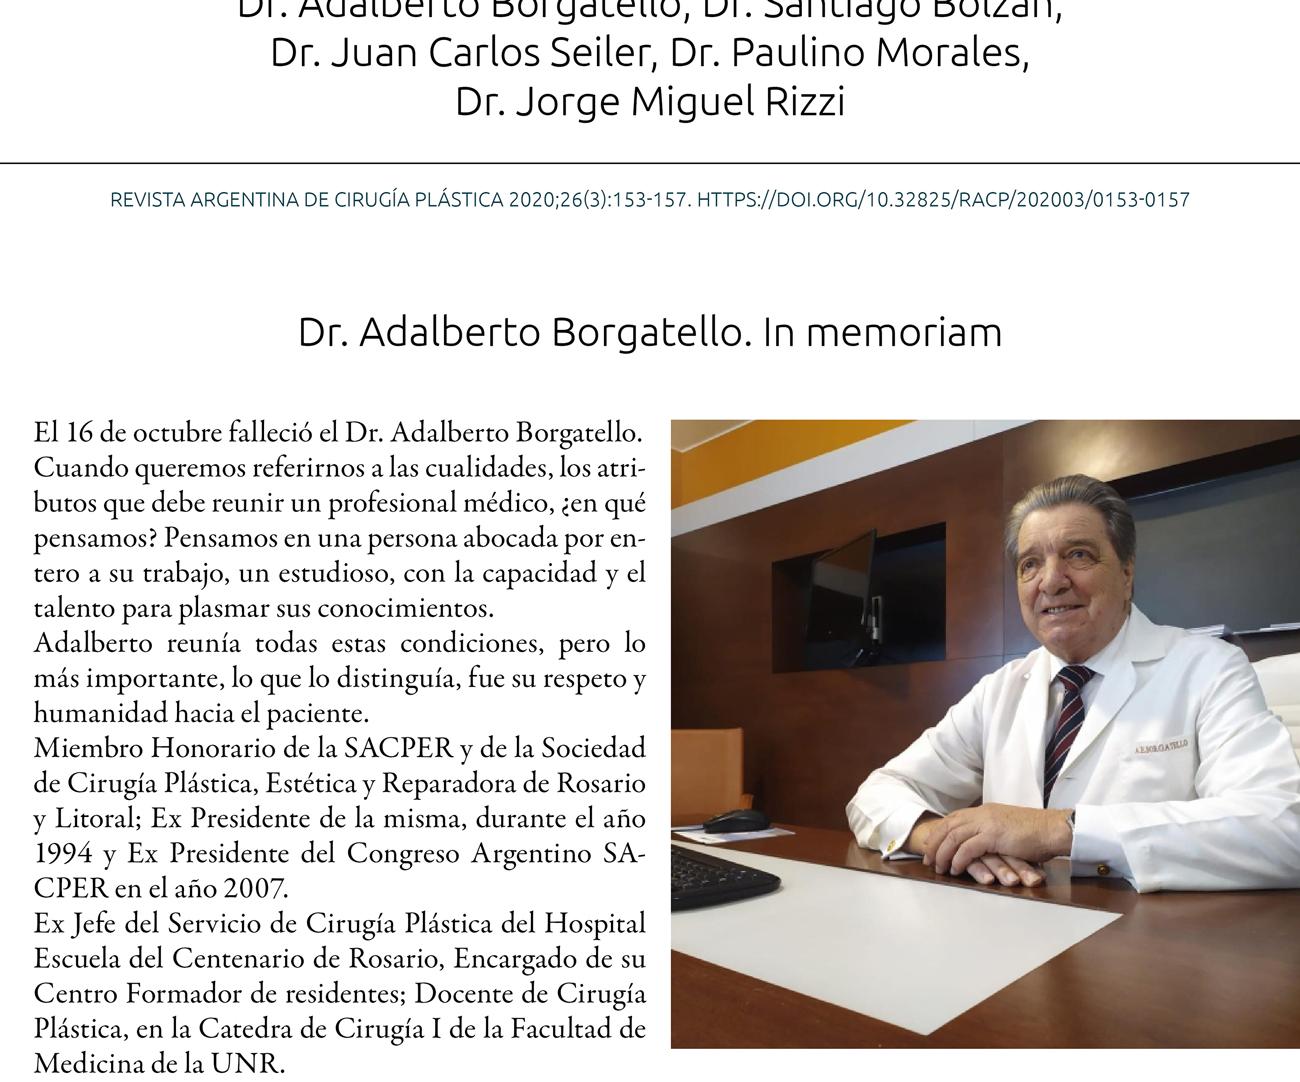 Dr. Adalberto Borgatello, Dr. Santiago Bolzán,  Dr. Juan Carlos Seiler, Dr. Paulino Morales,  Dr. Jorge Miguel Rizzi